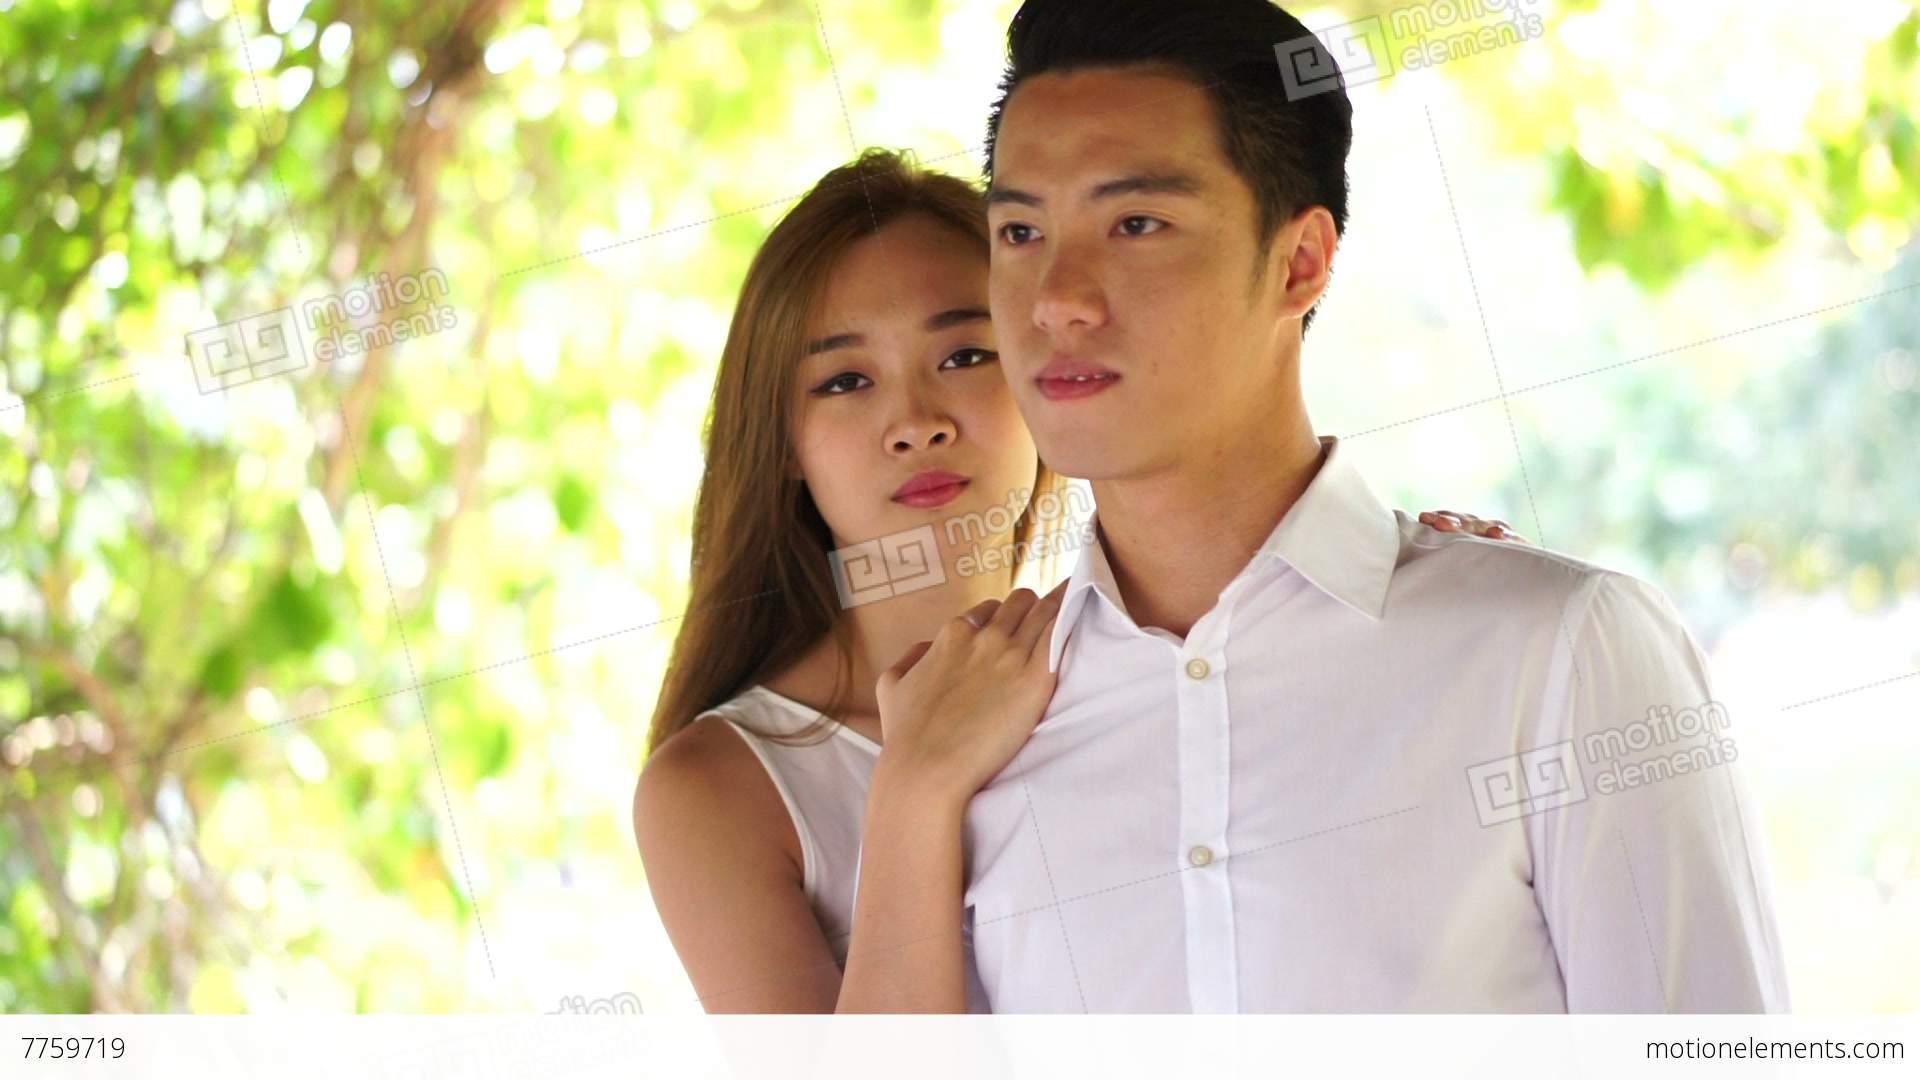 Couple uniform outdoor asian